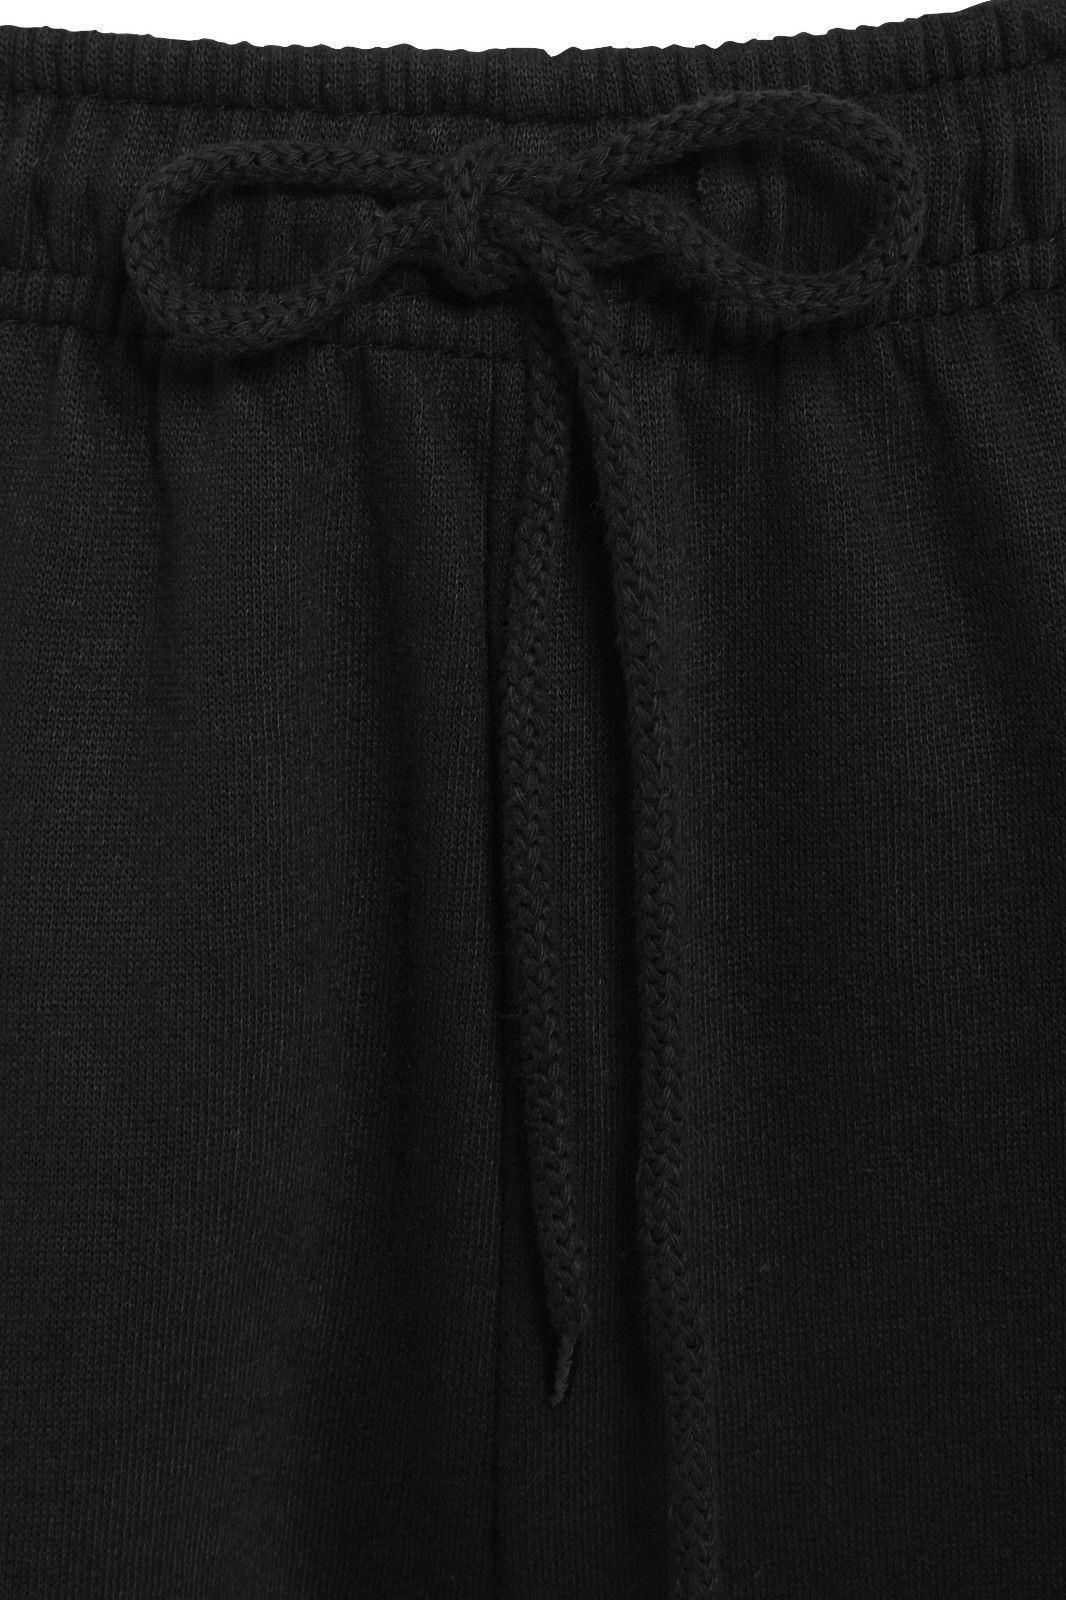 Uomo-Casual-Tinta-Unita-Pantaloni-sportivi-Bottoms-Apri-Hem-Sudore-Pantaloni-Tasche-Con-Zip miniatura 3